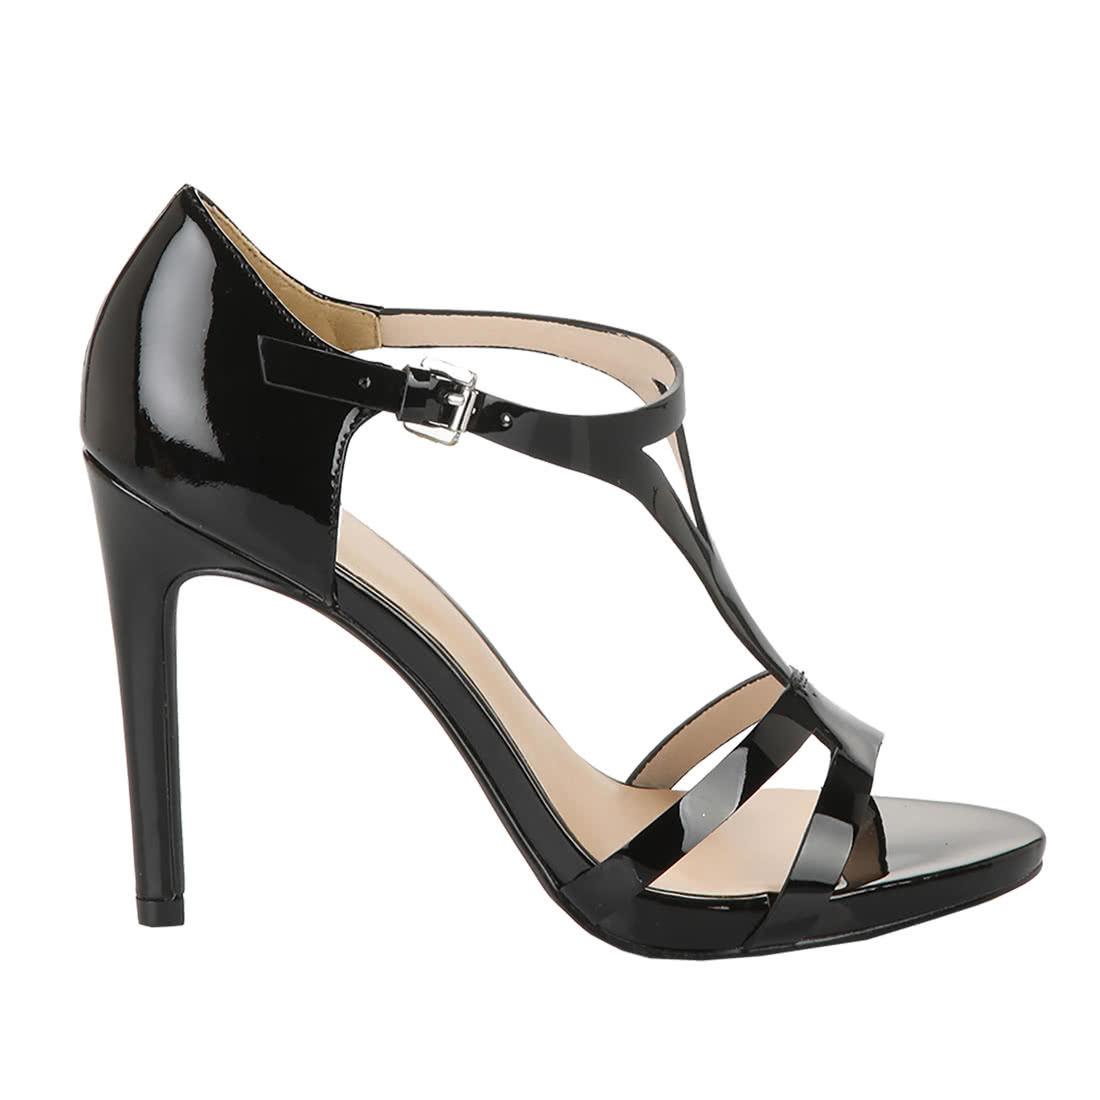 c6196551130 Mistletoe ankle-strap sandal patent leather black buy online in ...